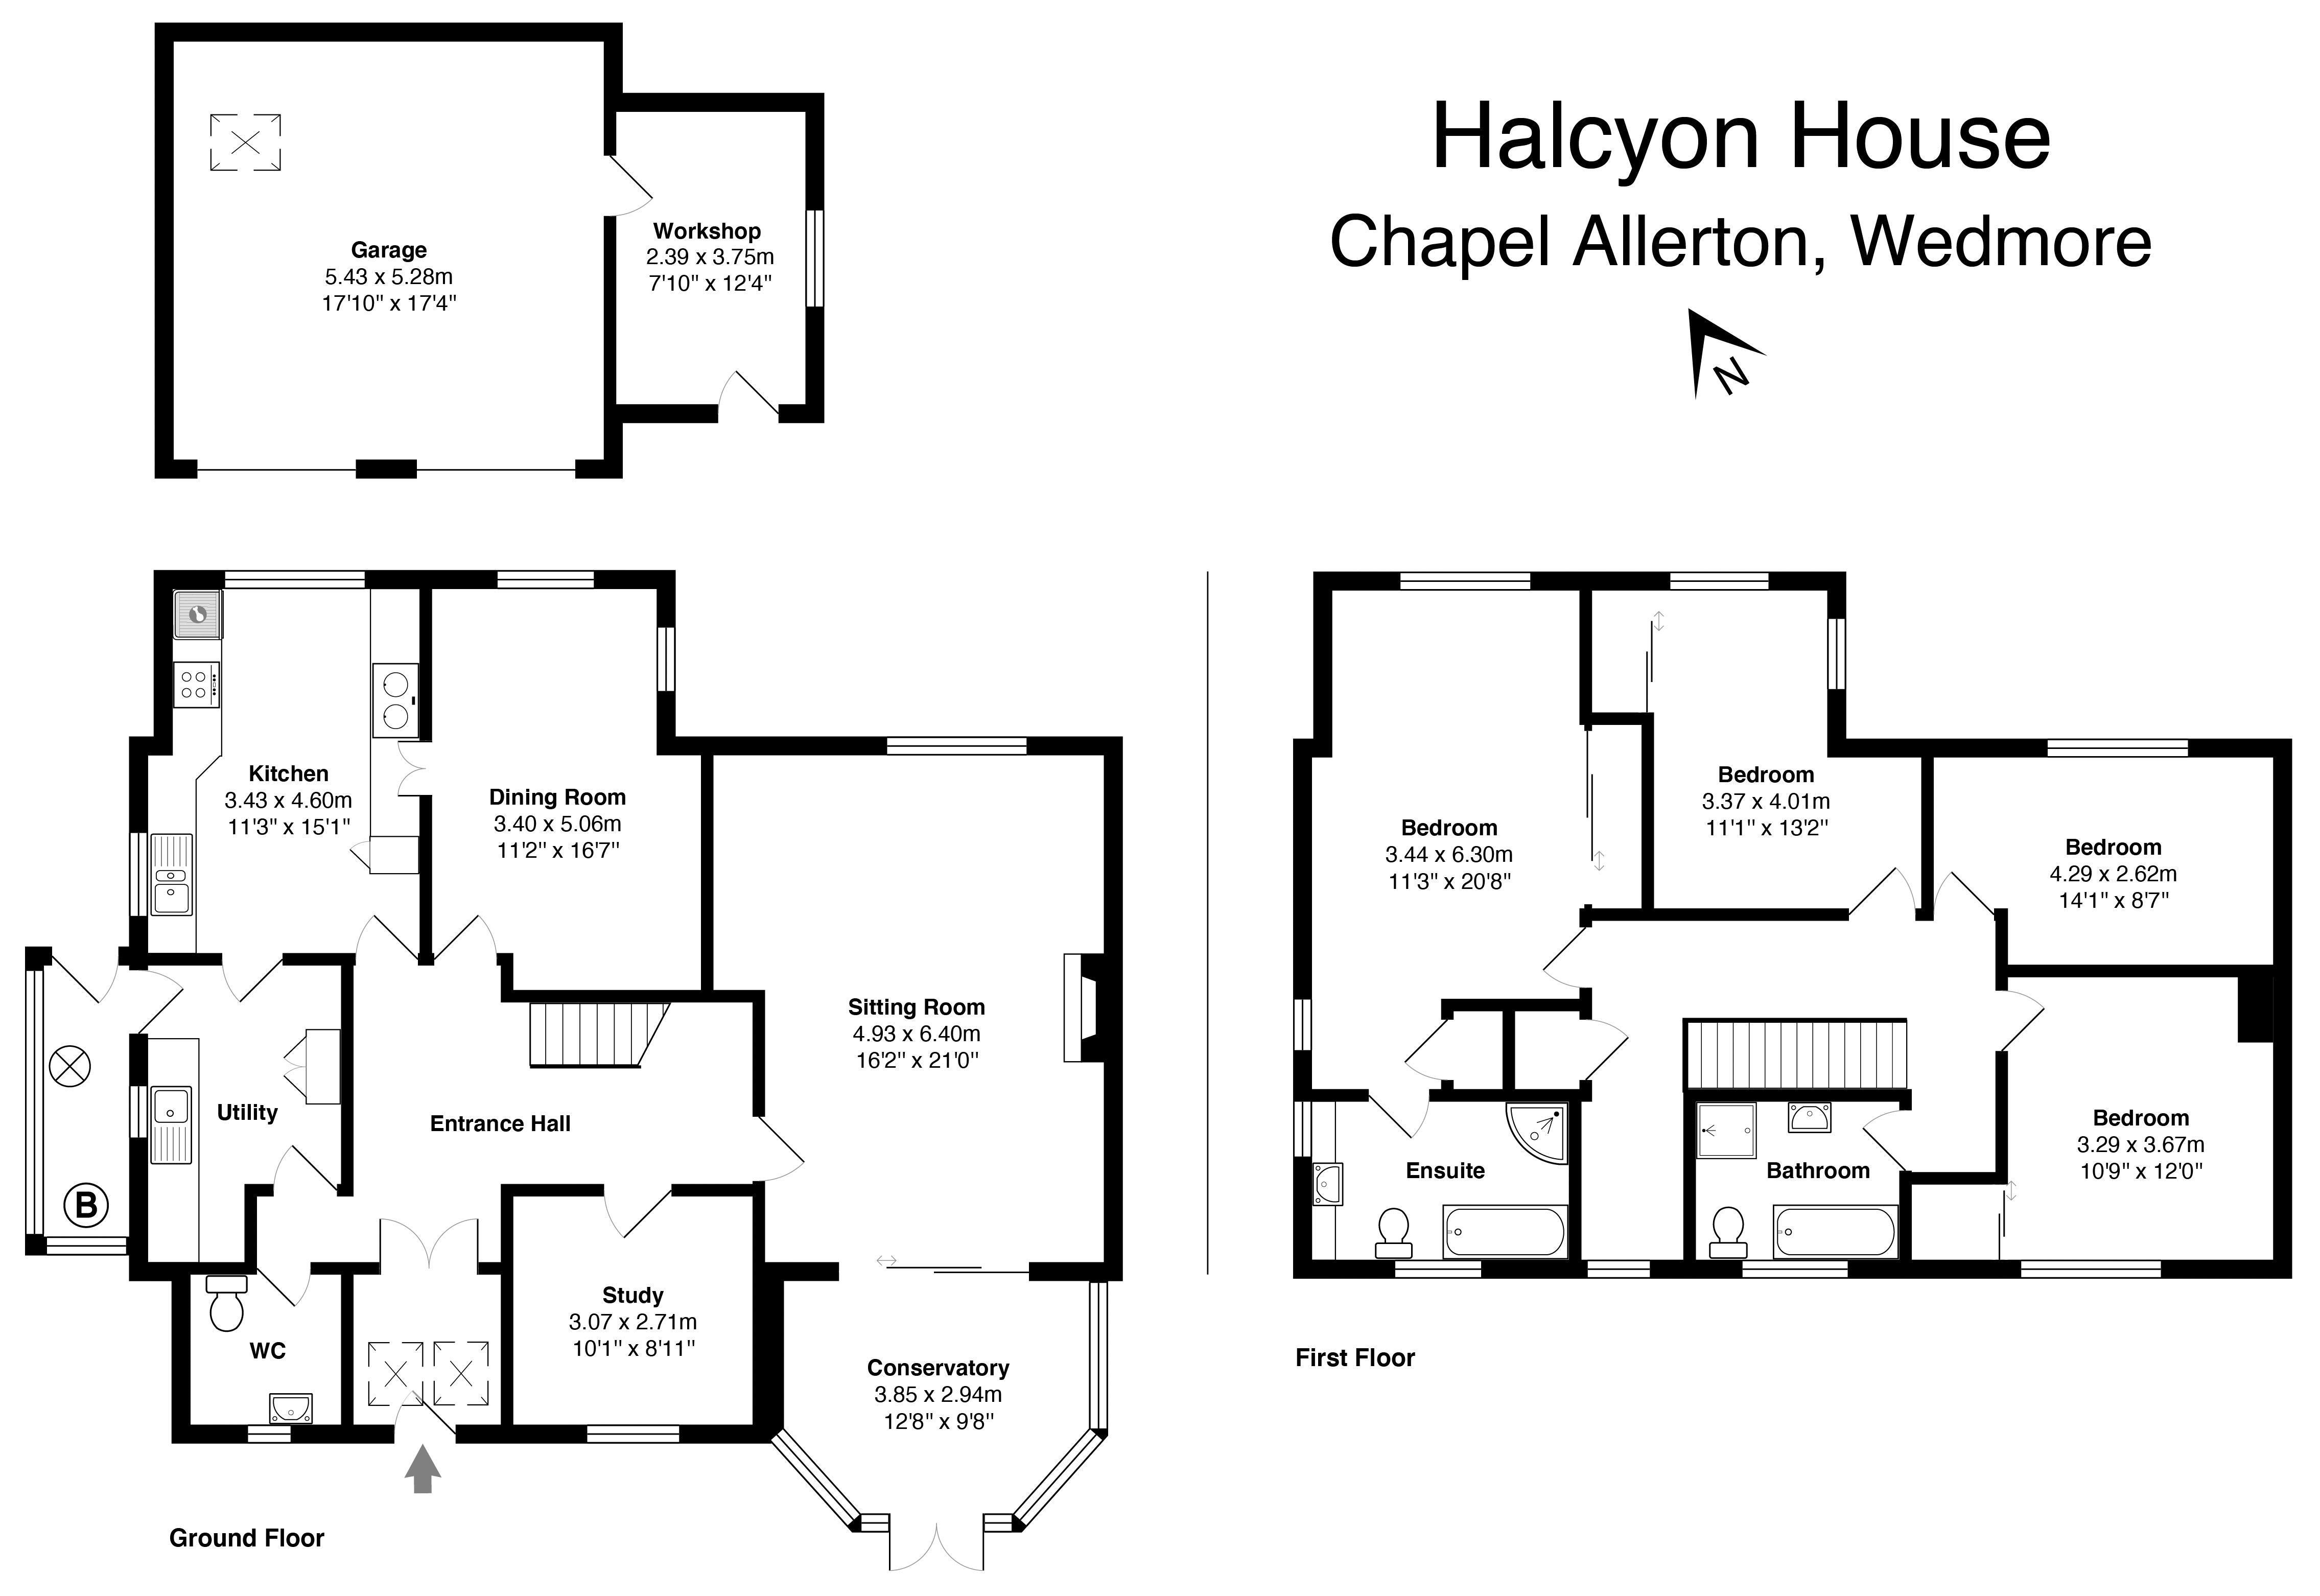 Chapel Allerton